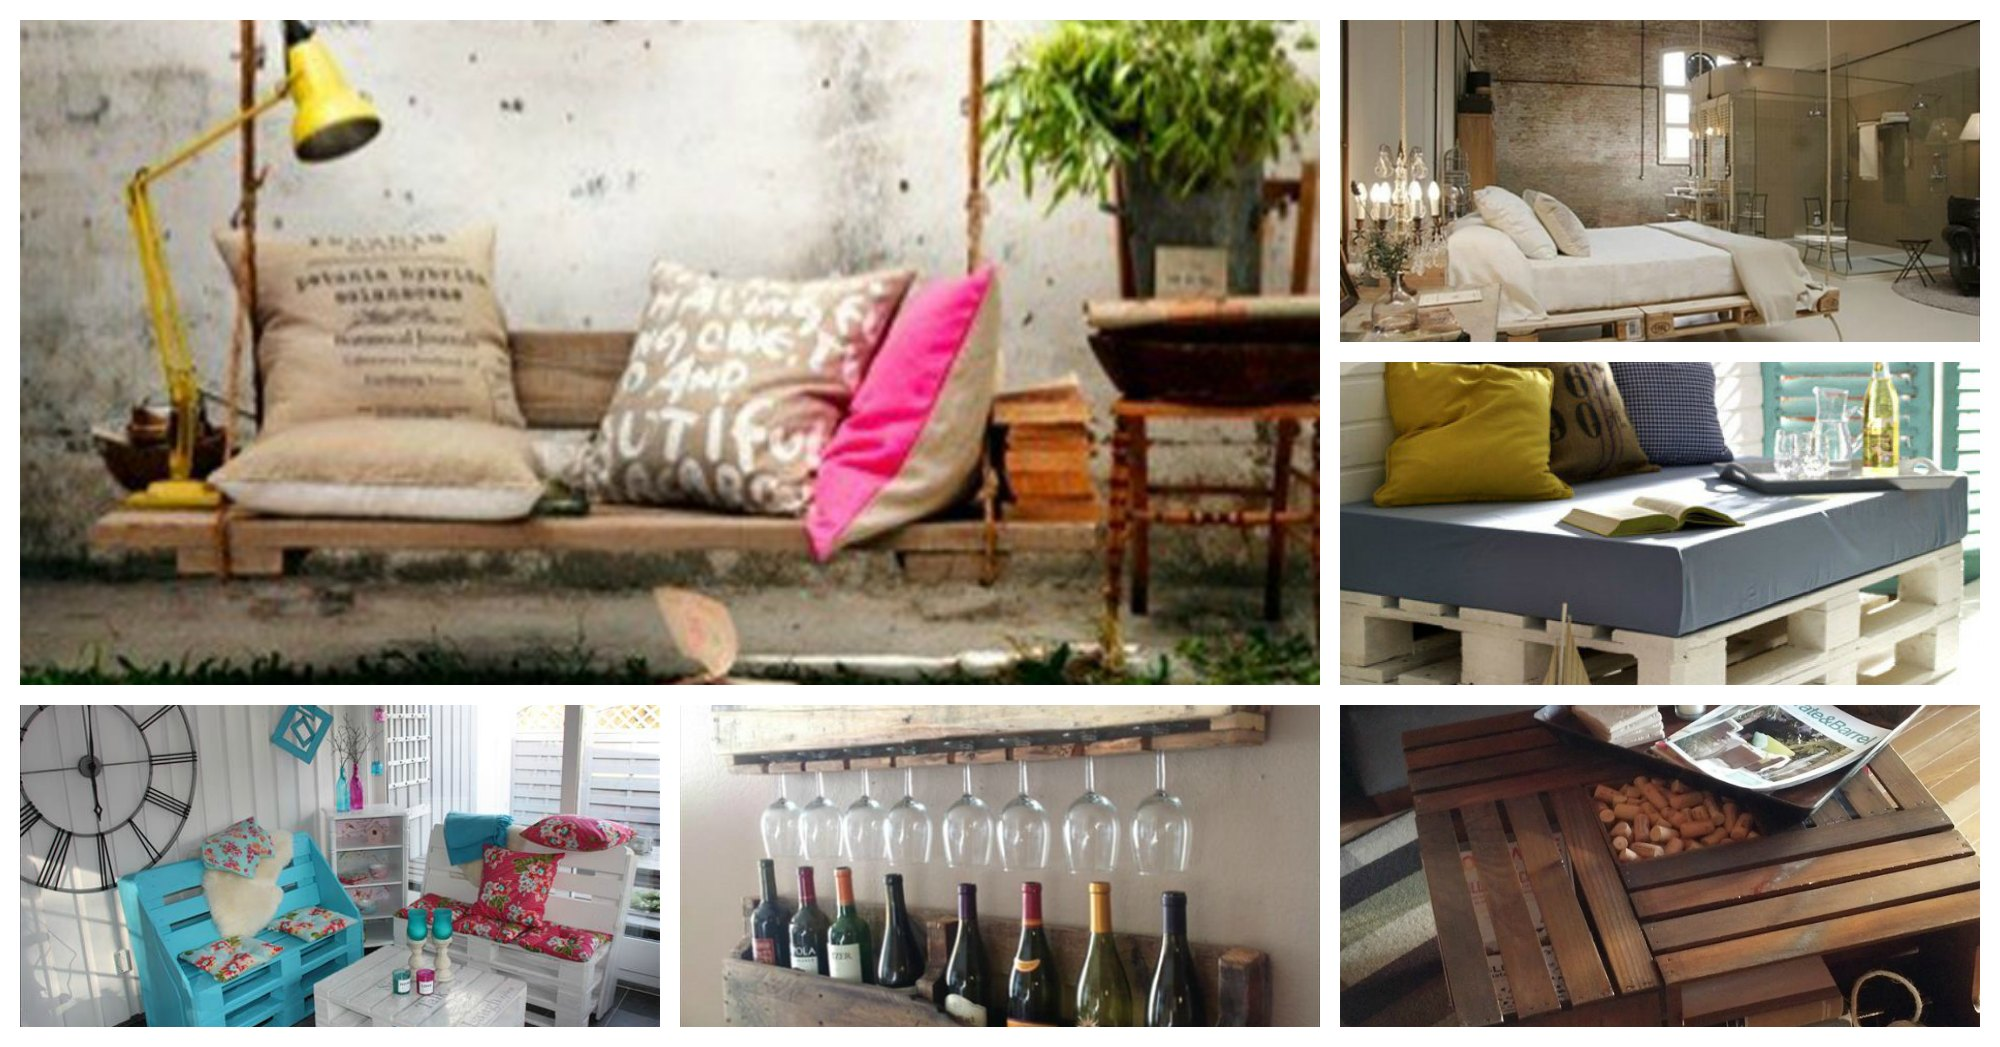 20 ideas creativas para reciclar palets de madera - Ideas para reciclar unos palets ...